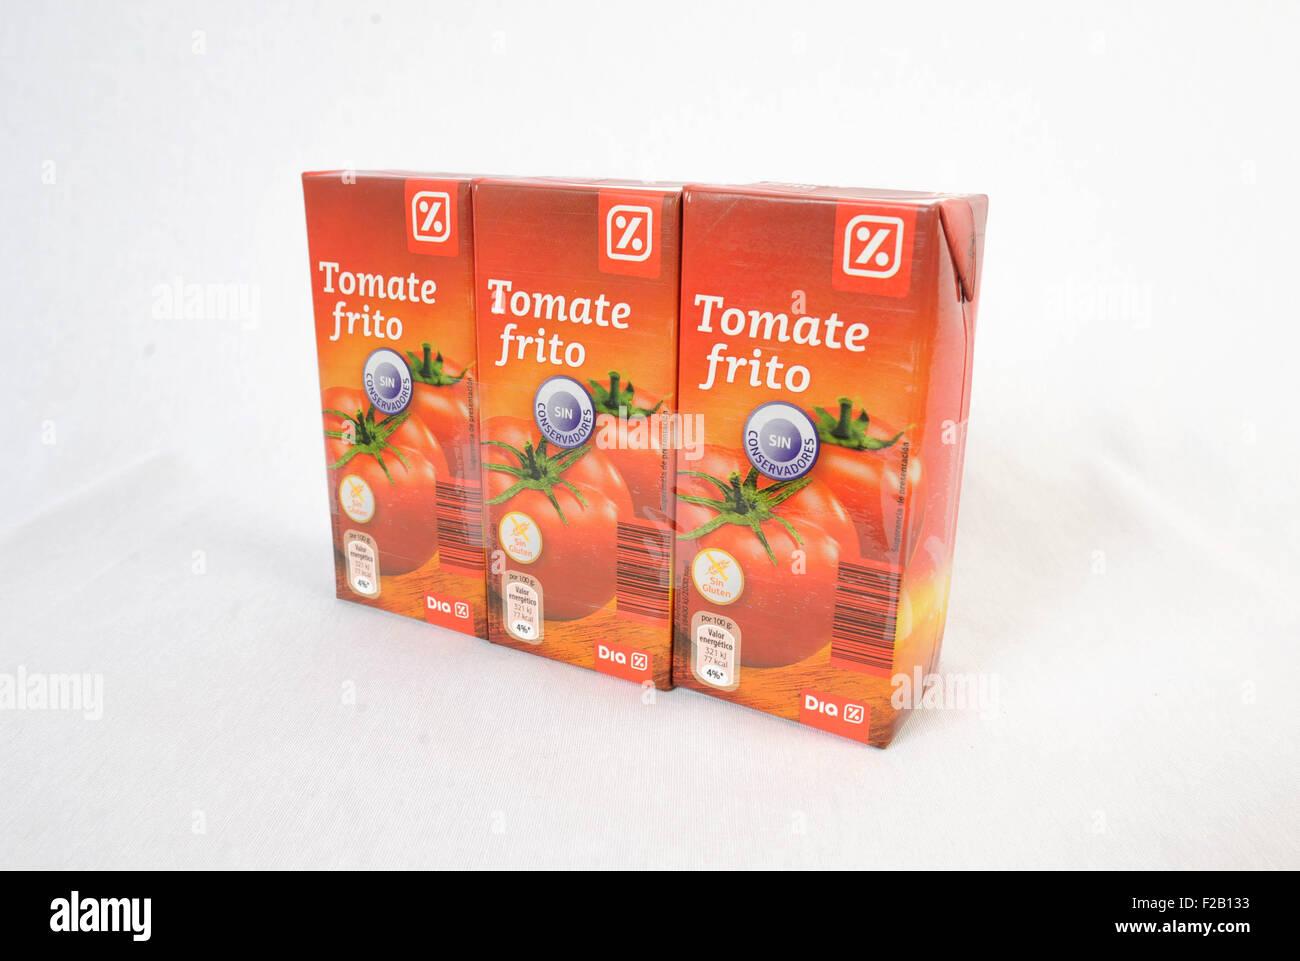 Gebratene Tomaten von der Supermarkt Día´s Eigenmarke--tomate Frito De La Marca Blanca del Supermercado Stockbild